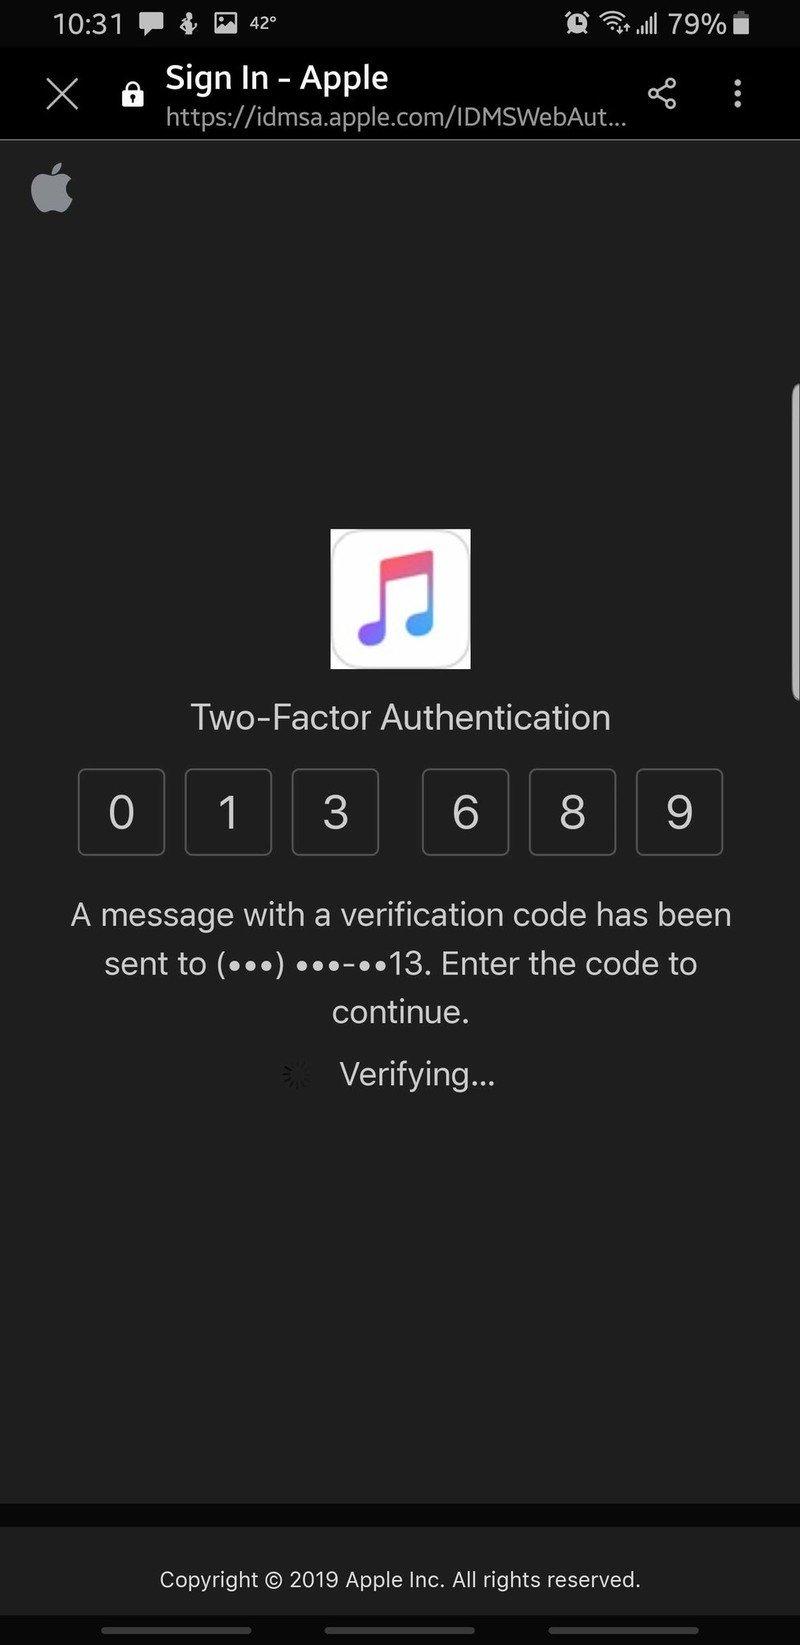 amazon-echo-apple-music-9.jpg?itok=3SUdP